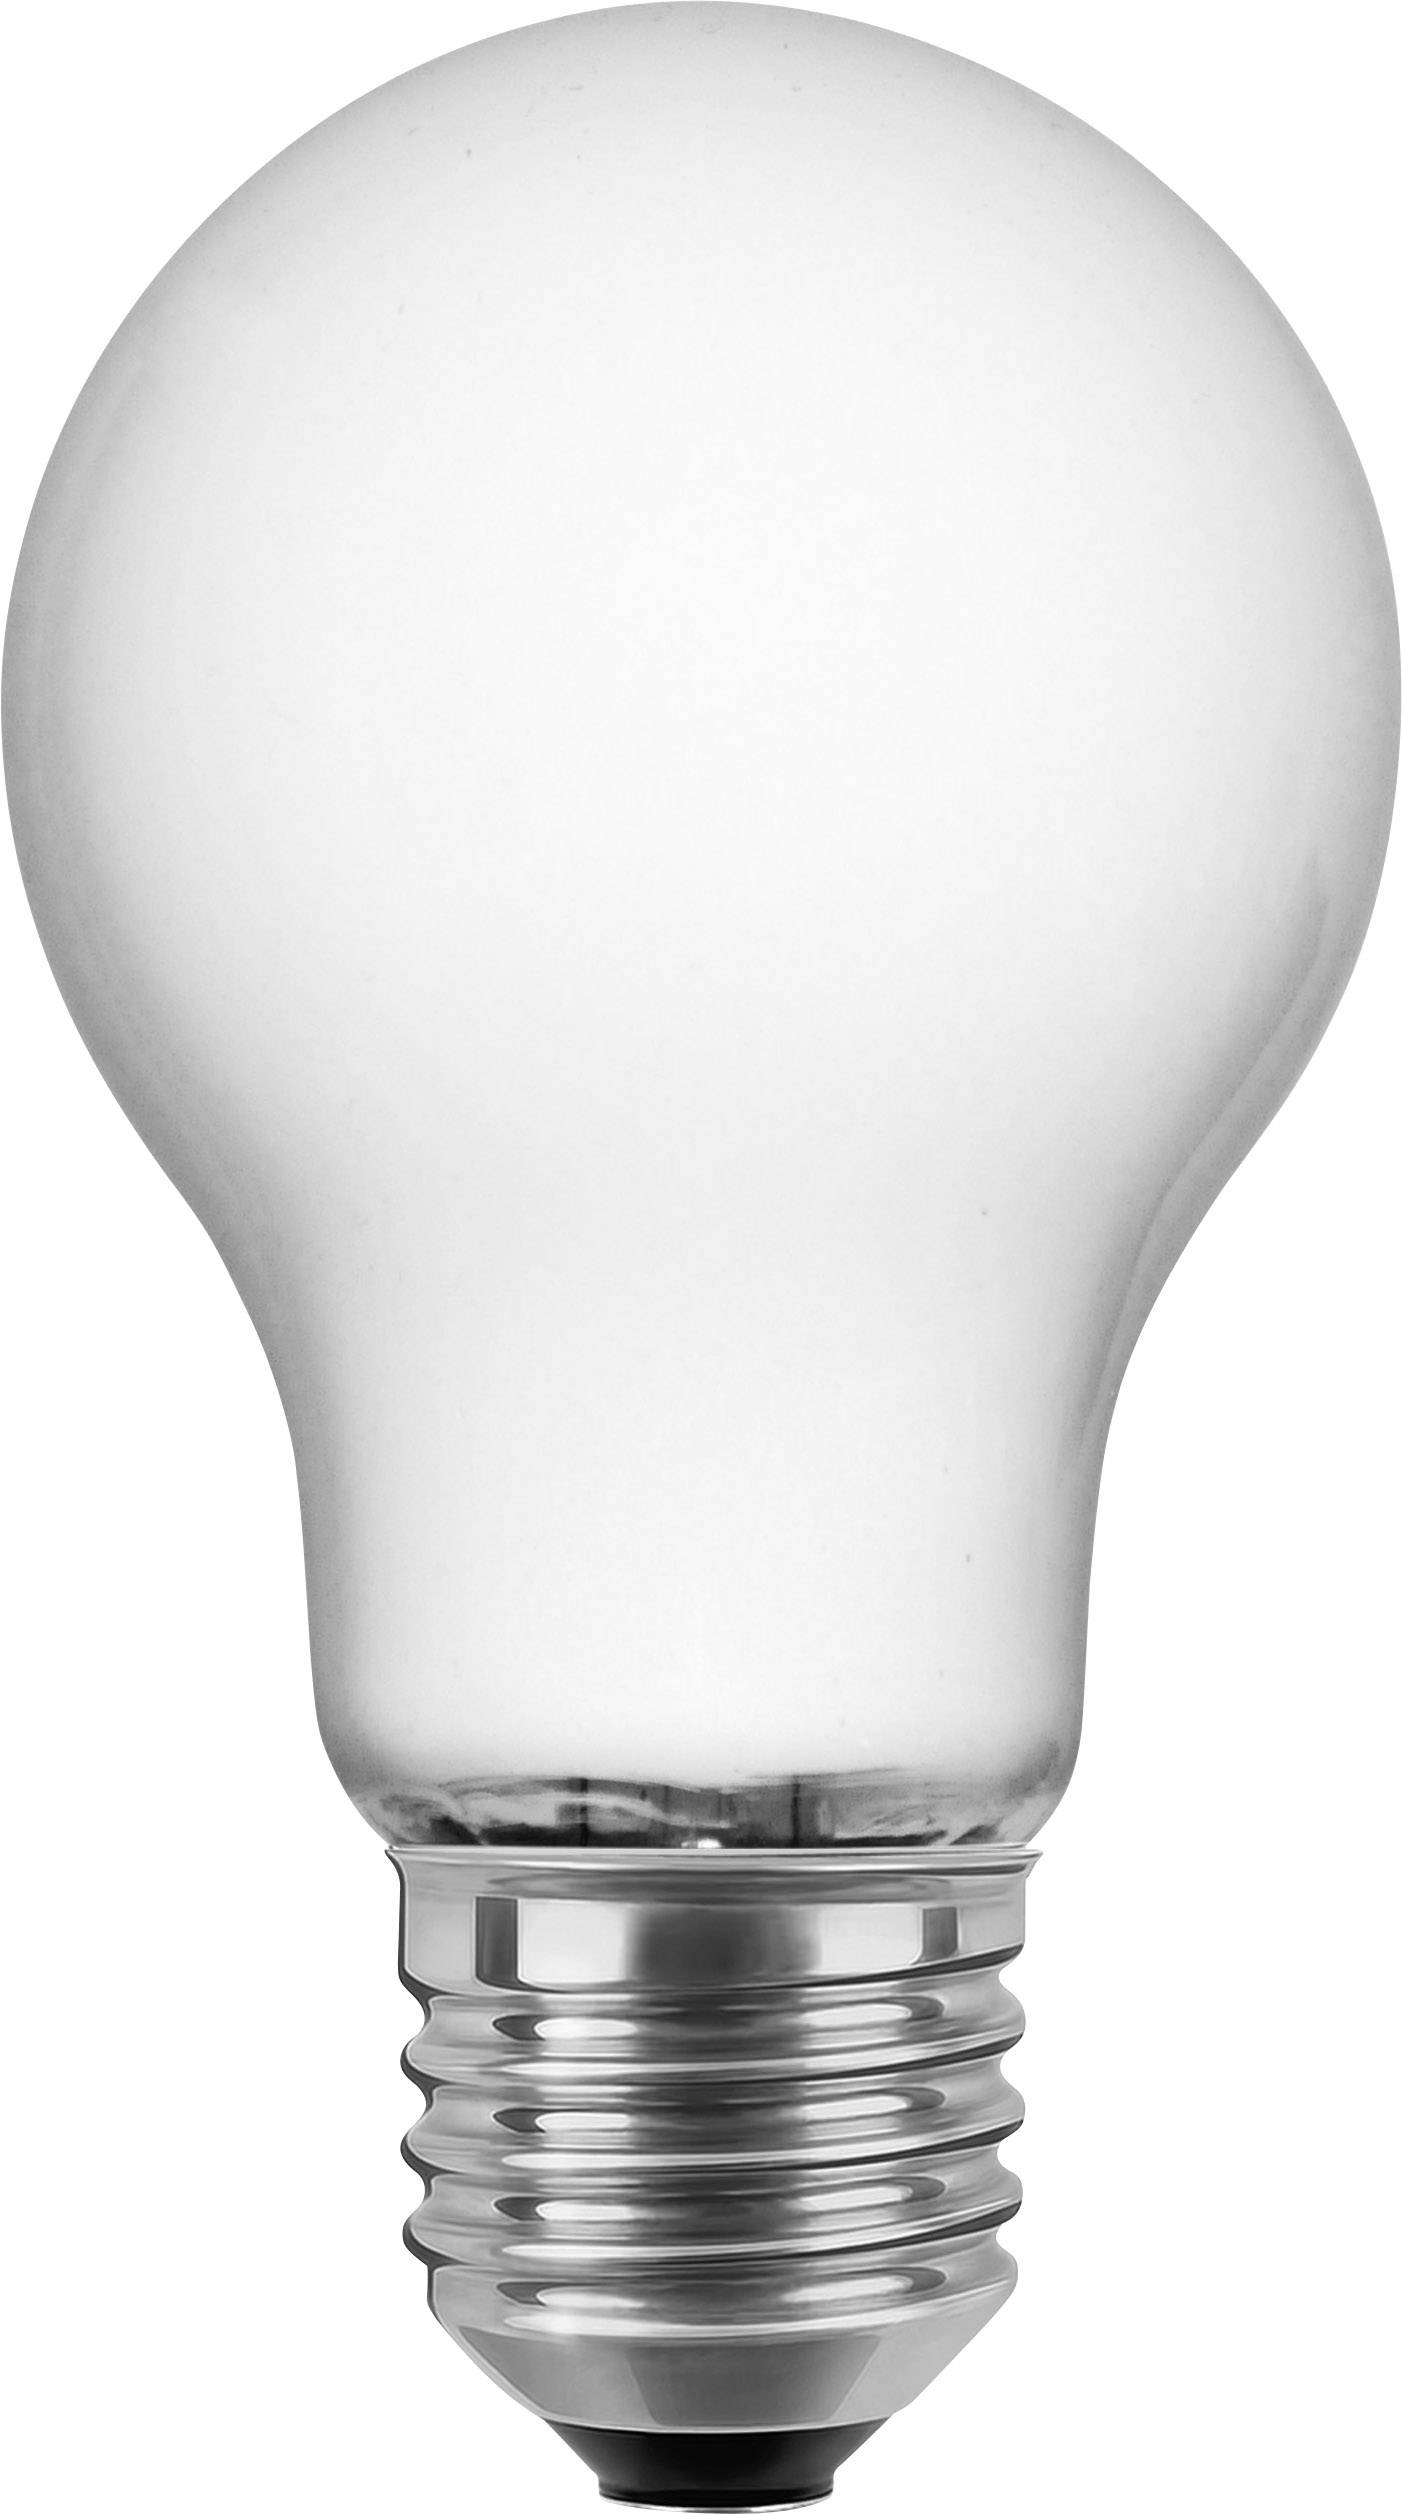 Segula LED Classe energetica A